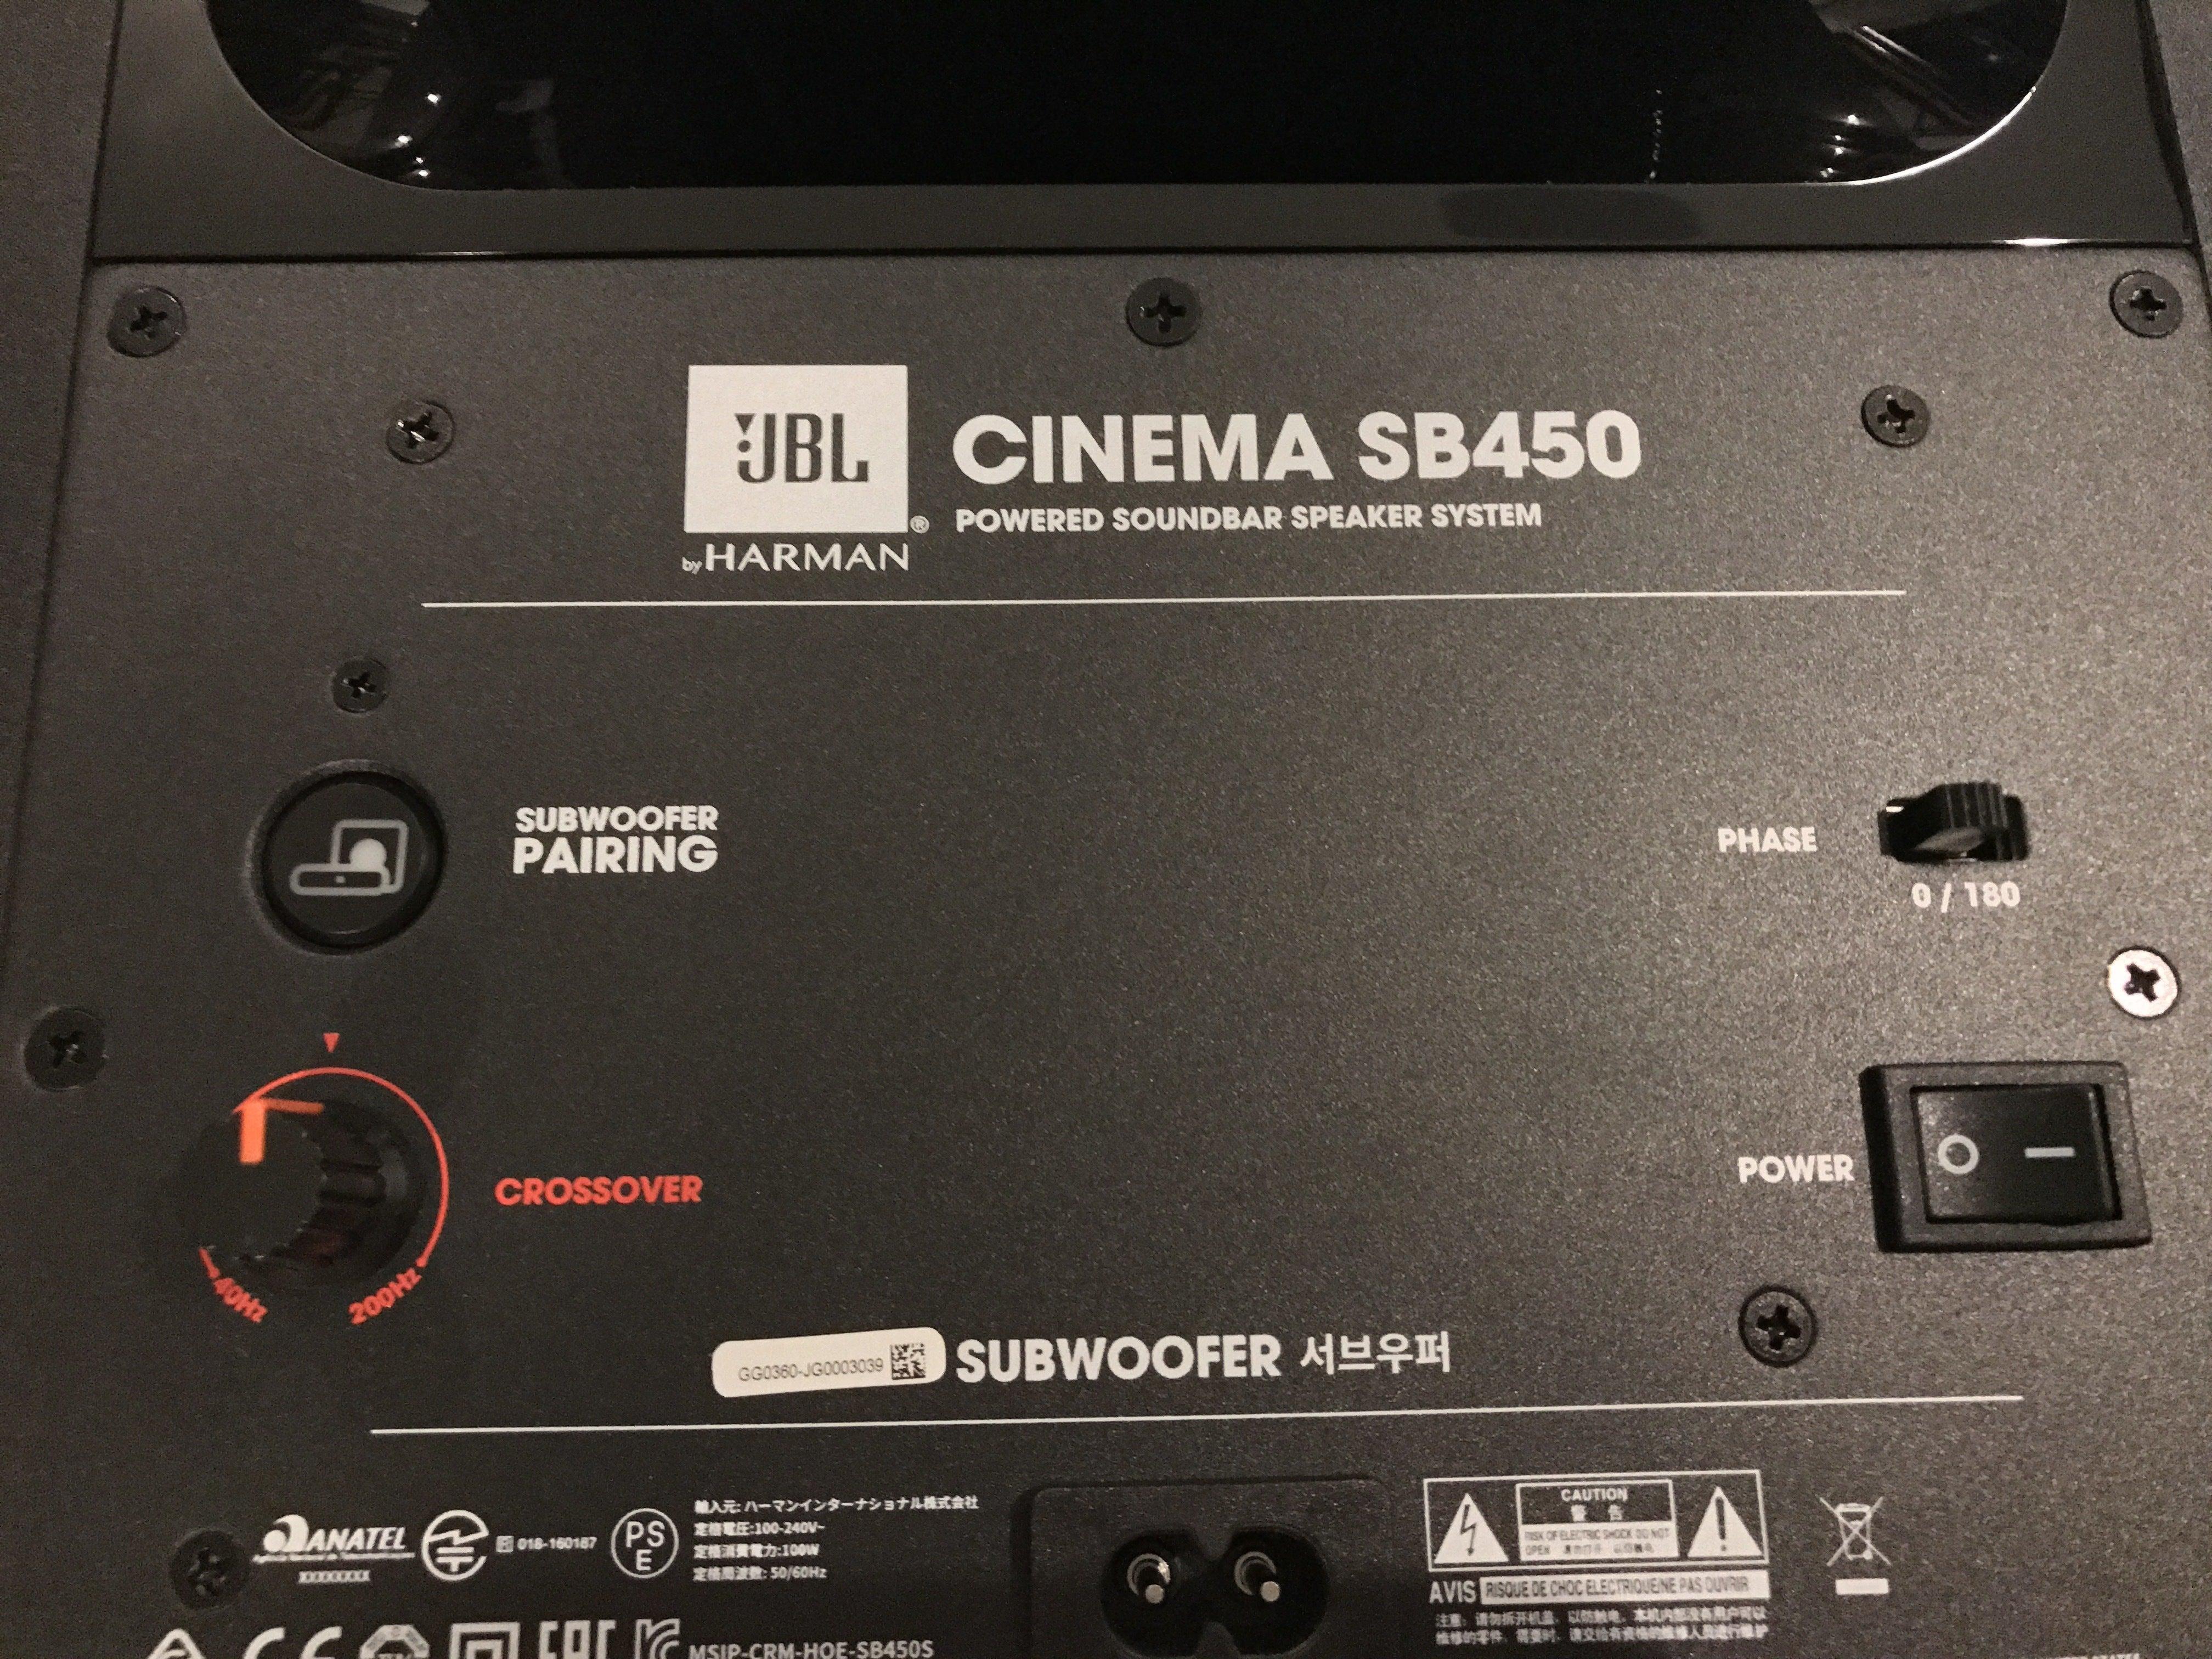 Jbl Cinema Sb 450 Soundbar Review This Speaker Is Made Manual Guide